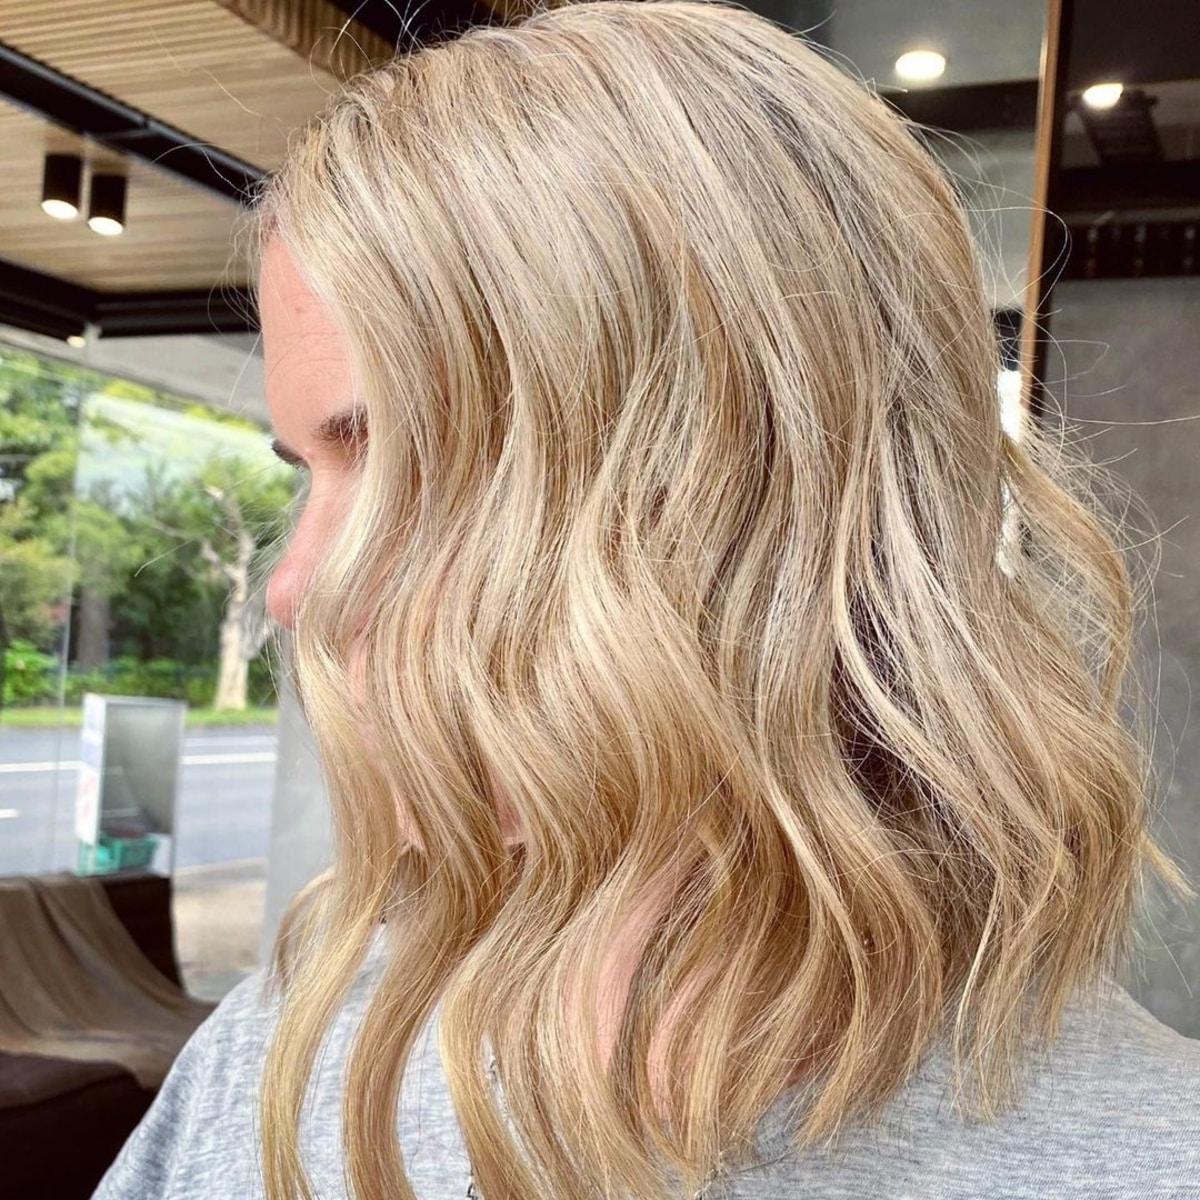 Coiffure longue blonde ondulée